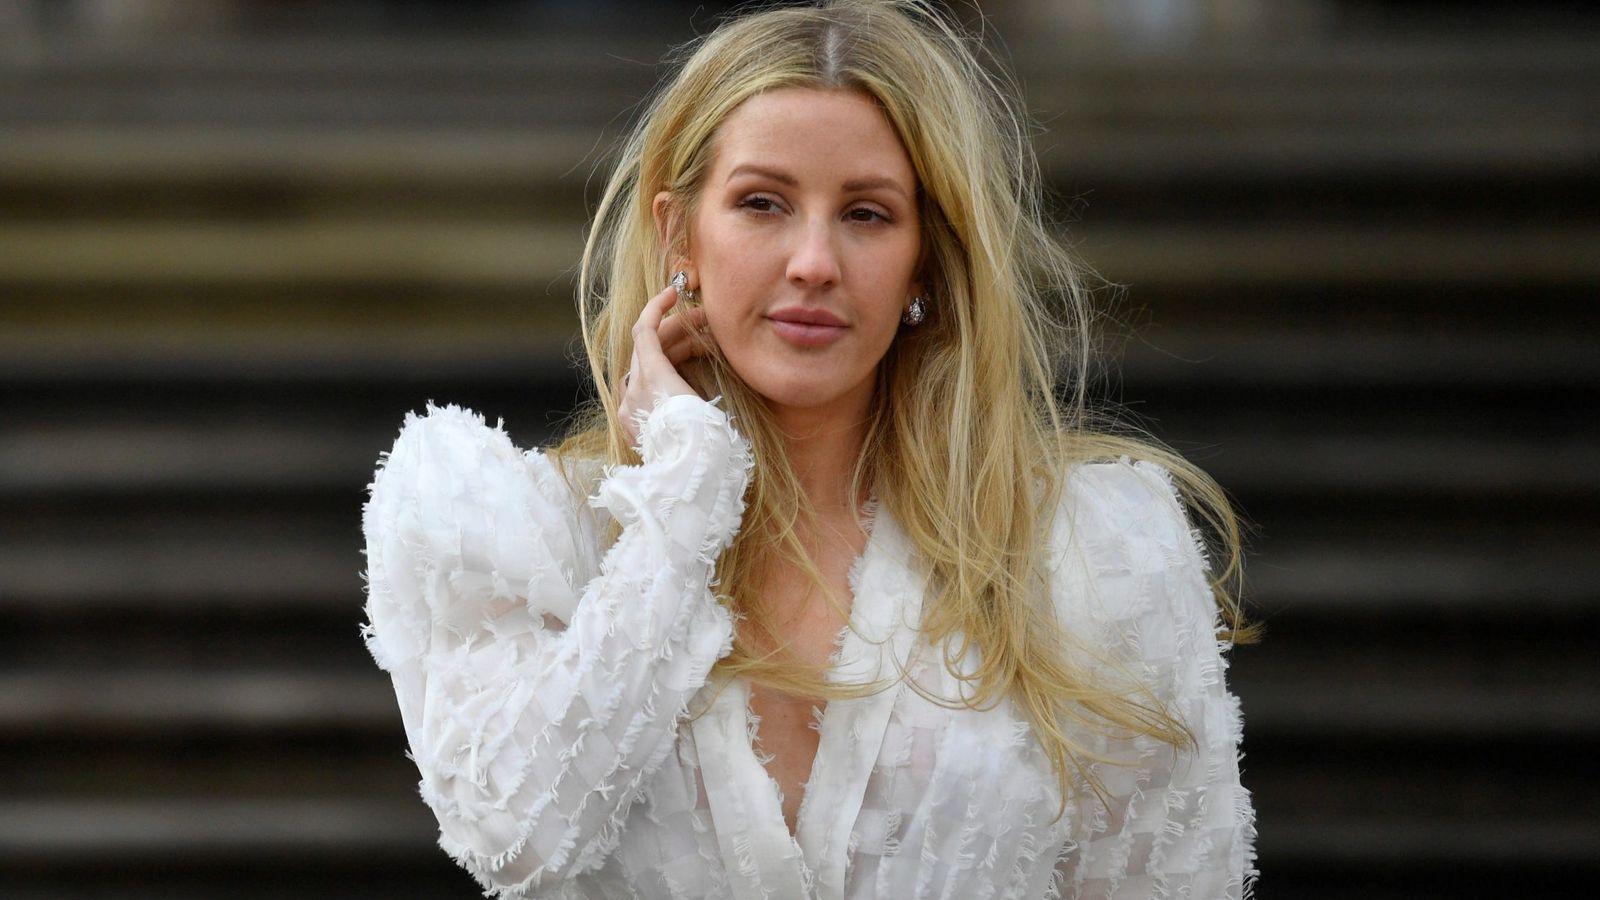 La boda de Ellie Goulding, ex de Harry, divide a la familia real ...